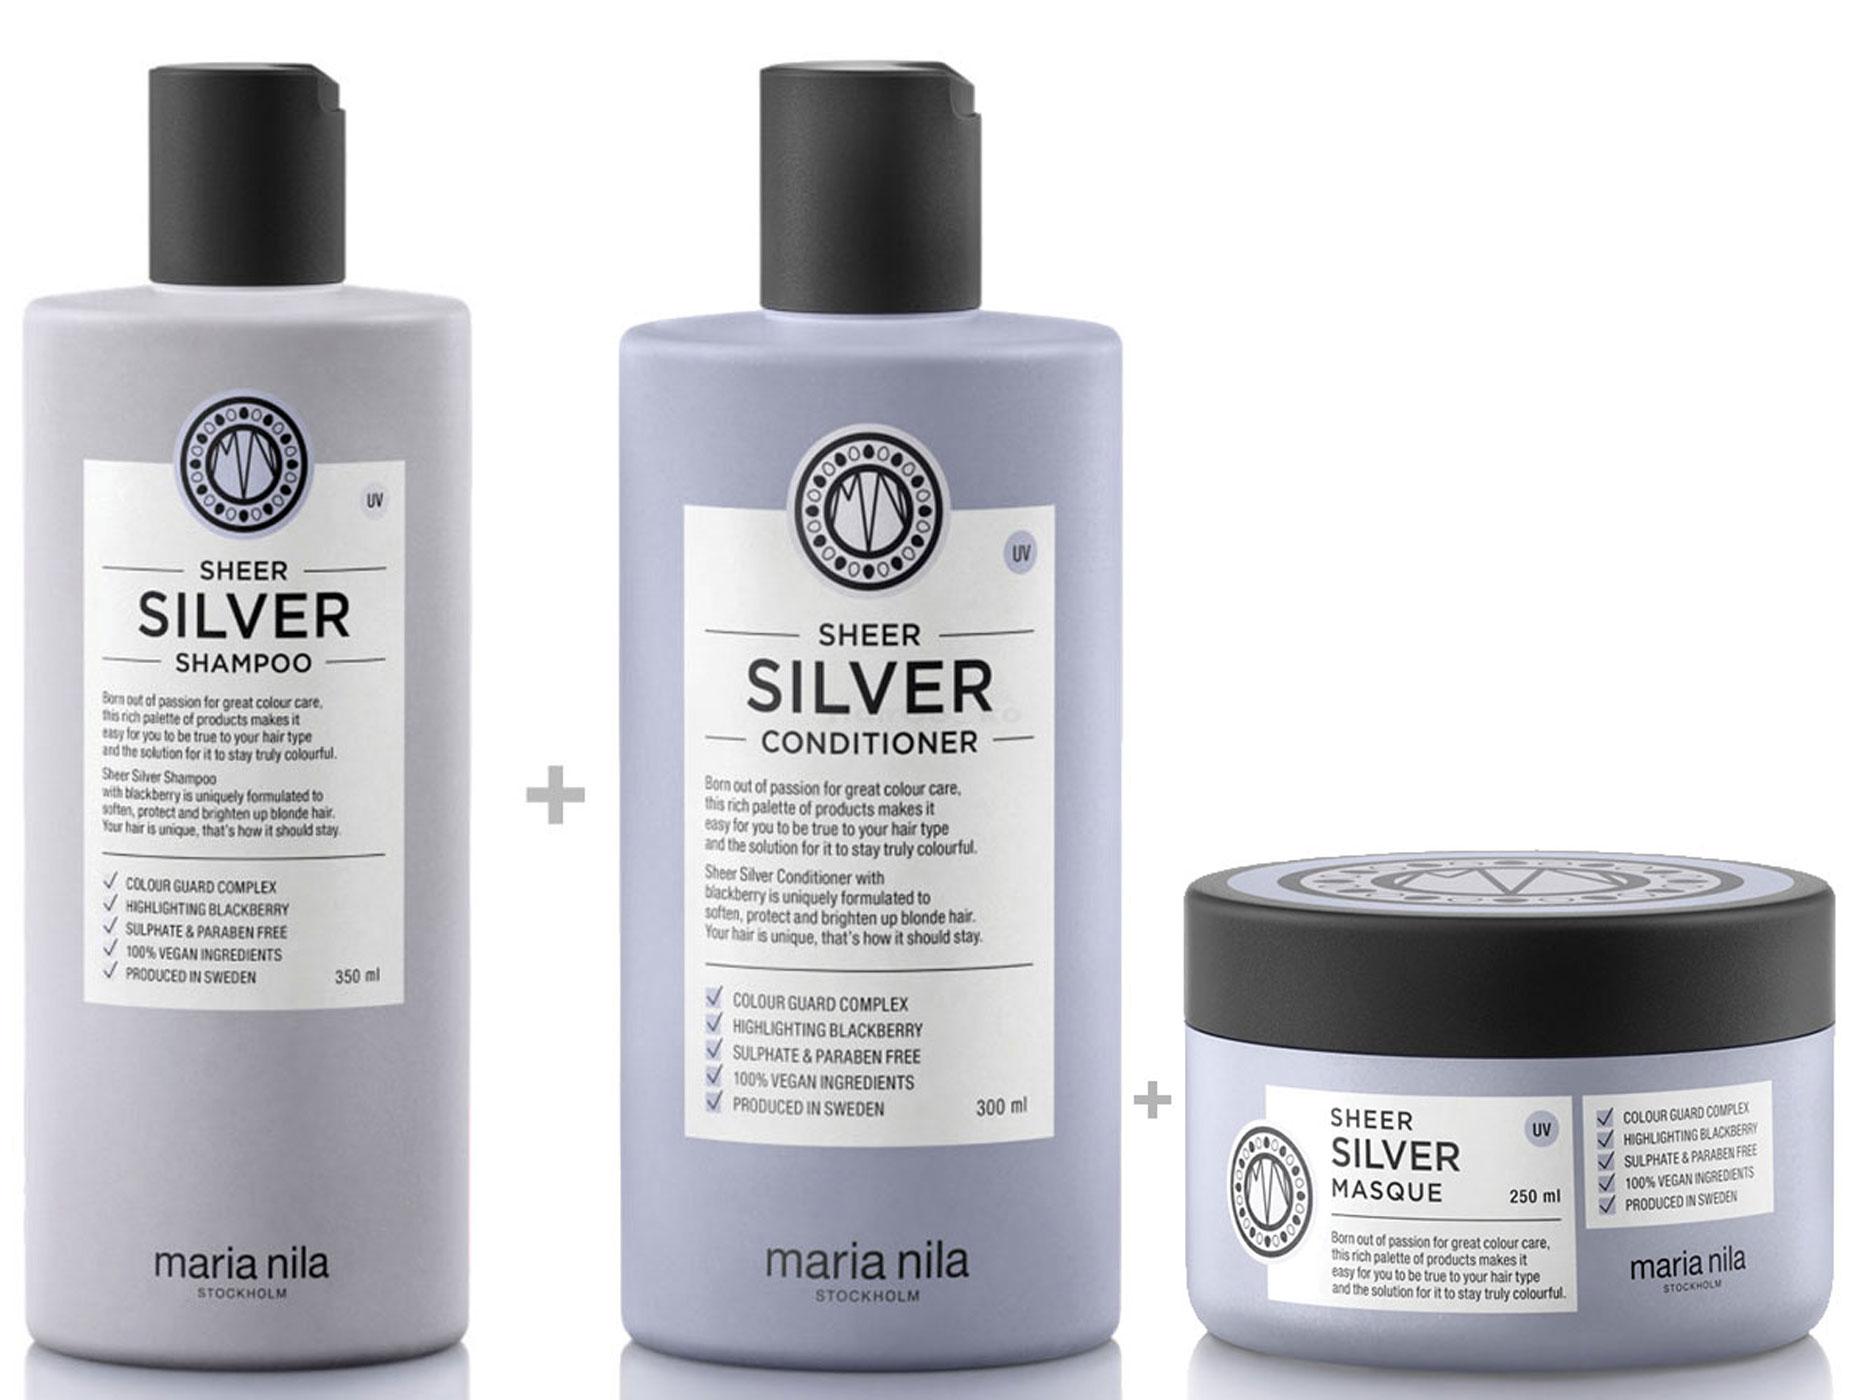 Maria Nila Sheer Silver Set - Shampoo 350 ml + Conditioner 300 ml + Masque / Maske 250 ml